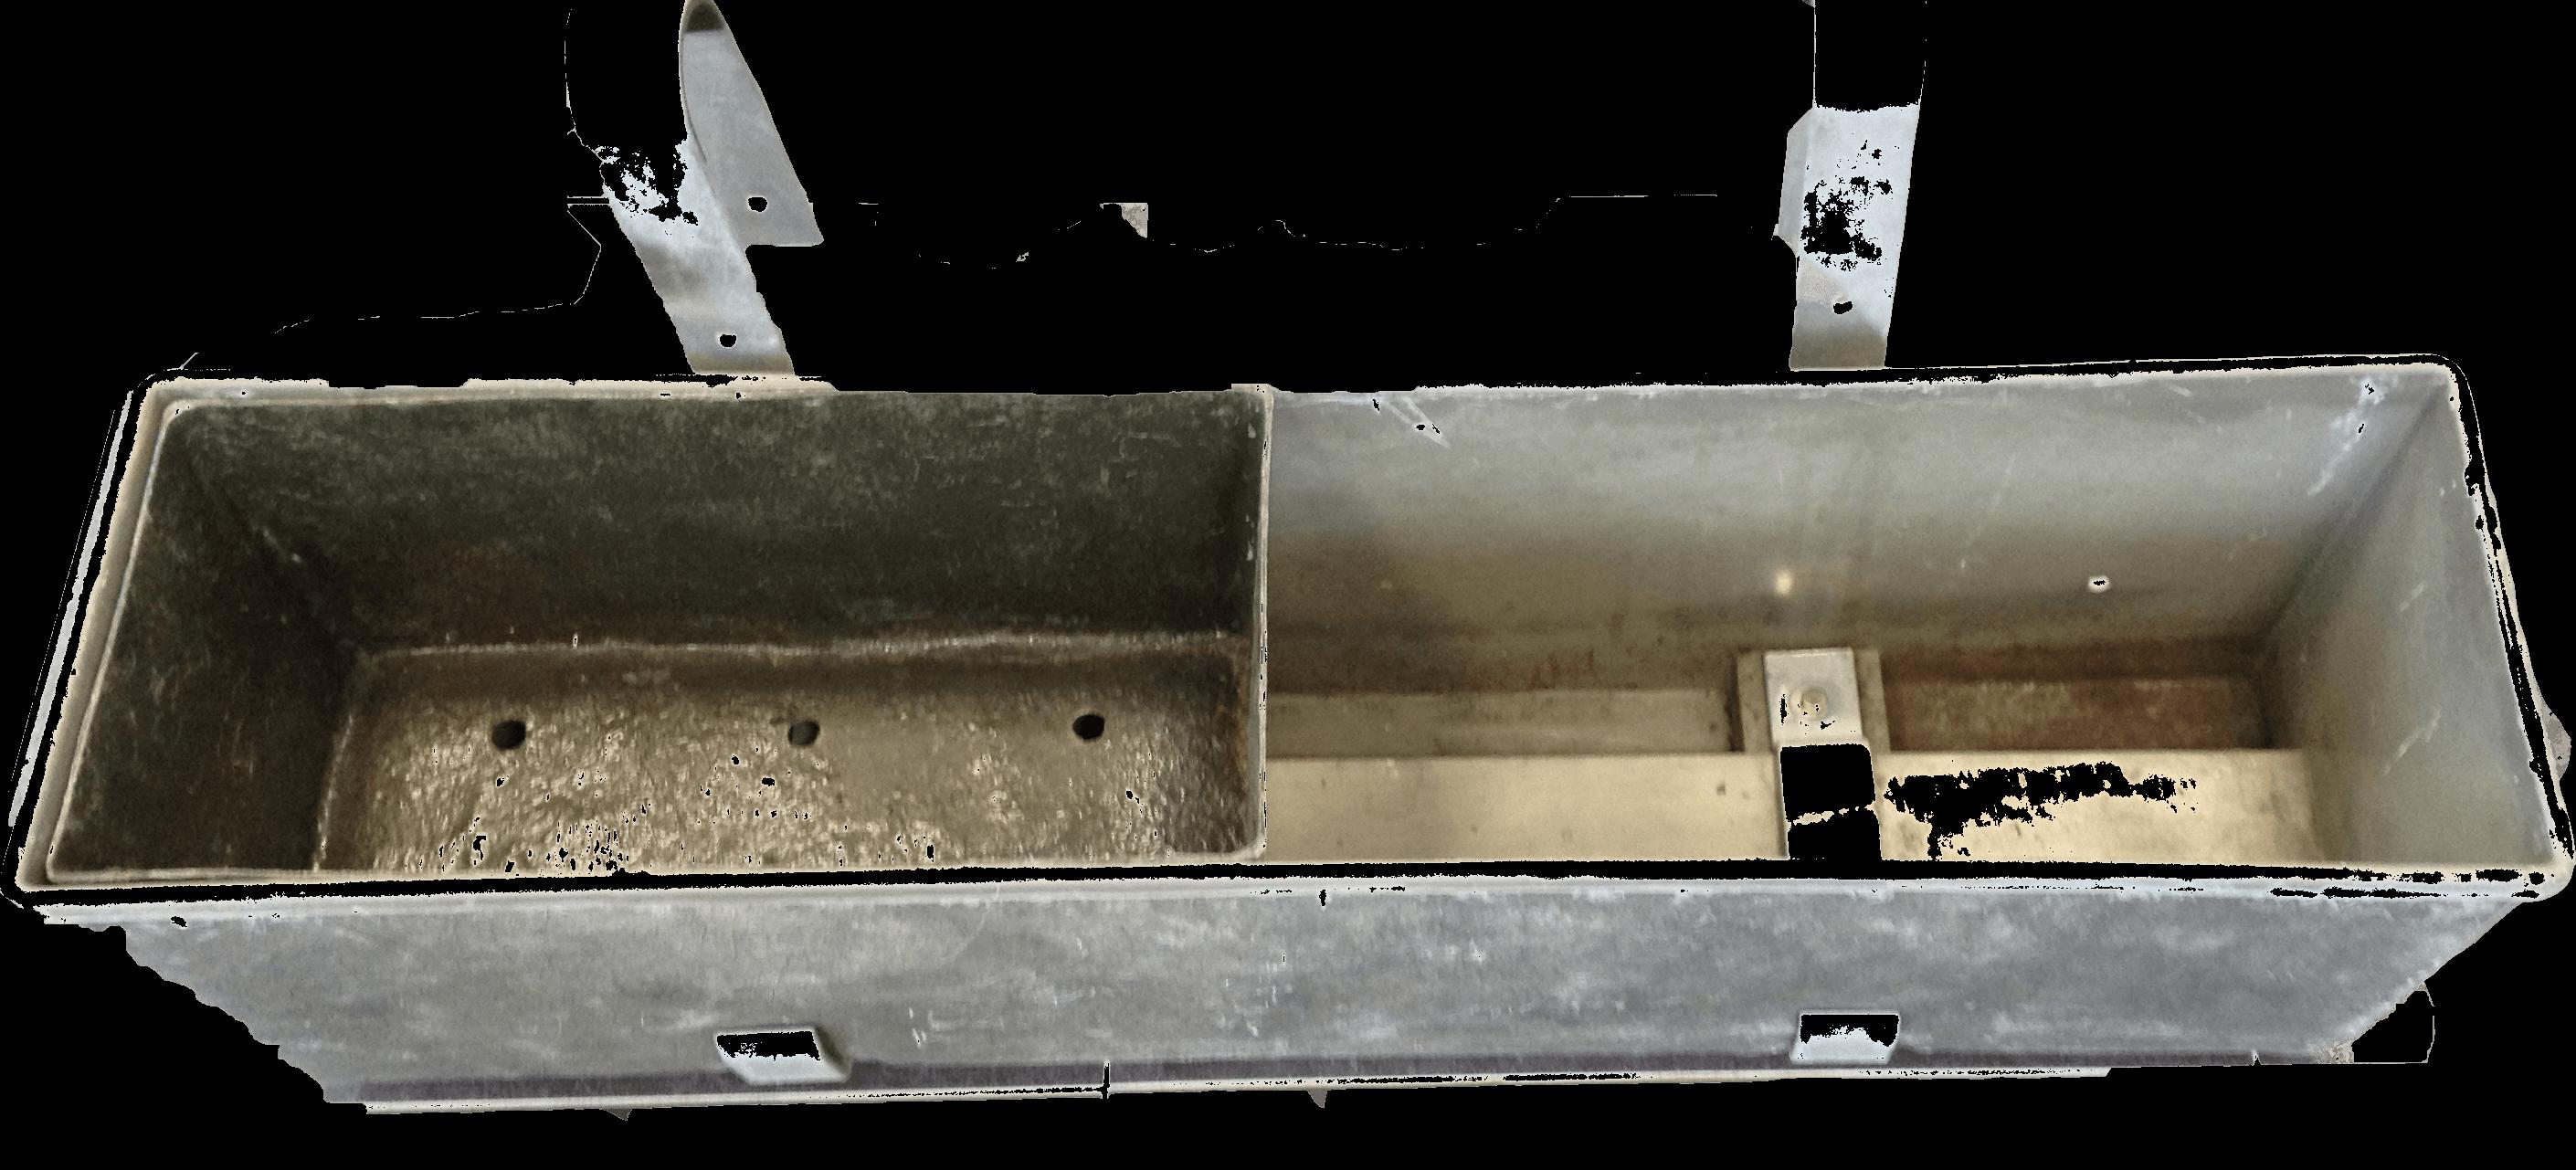 110x27x27 cm incl. ophangbeugels, met 2 losse binnenbakken.